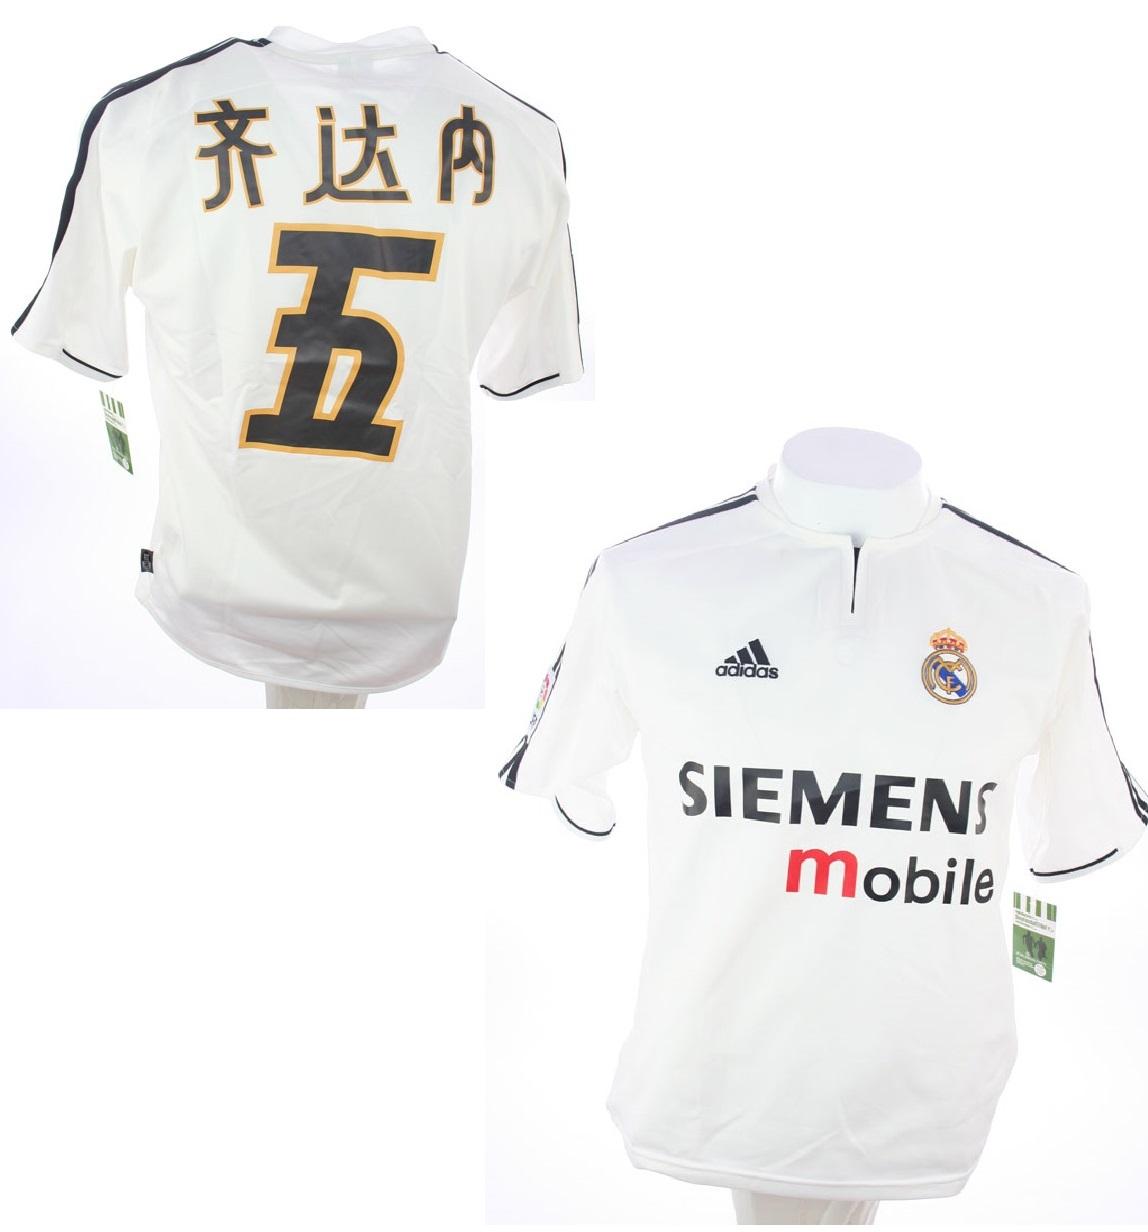 06ef42437d9 Adidas Real Madrid jersey 5 Zinedine Zidane chinese 2003 04 men s S ...